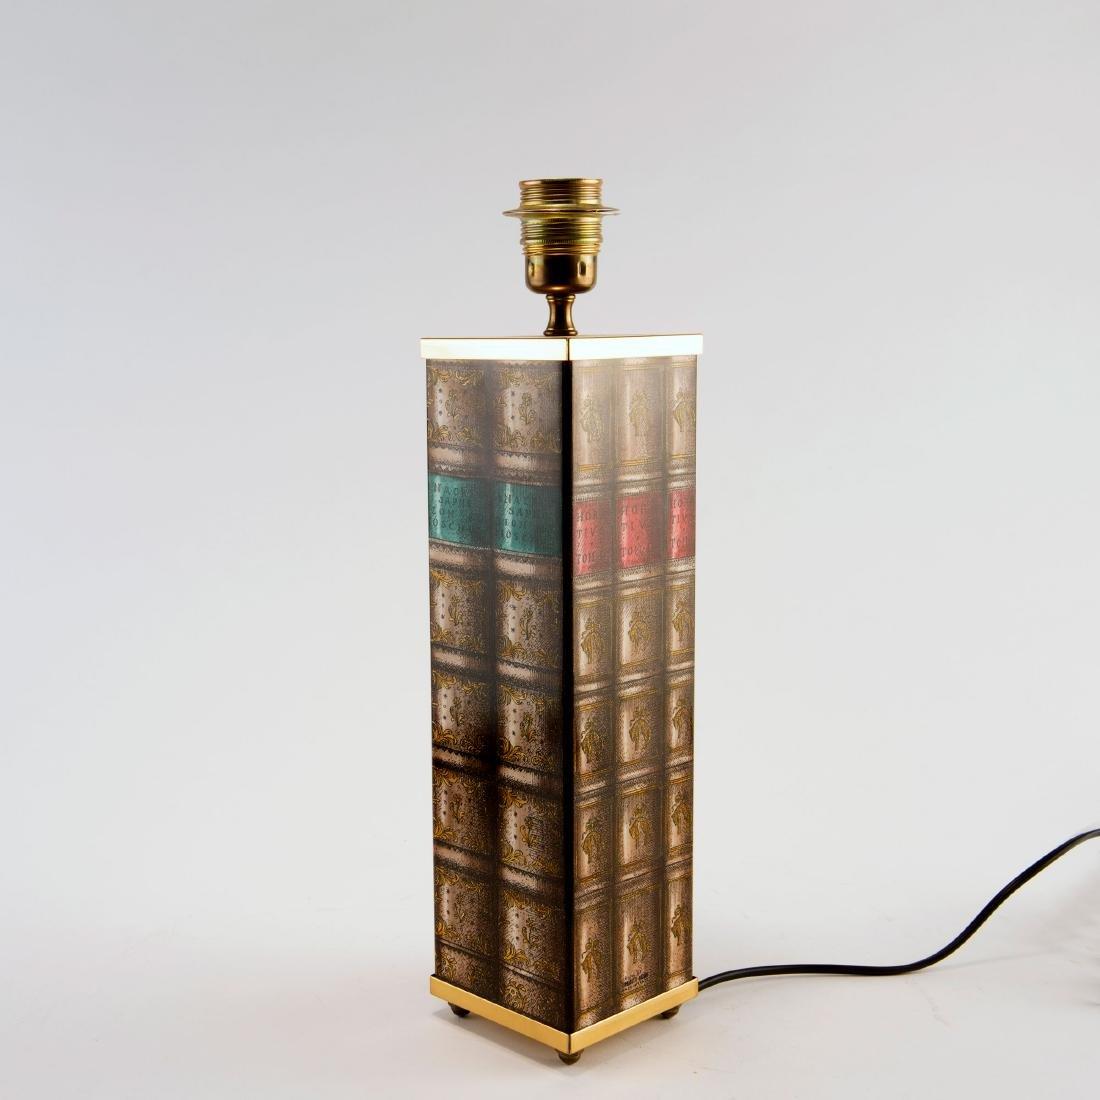 'Libri' lamp base, 1950s - 2